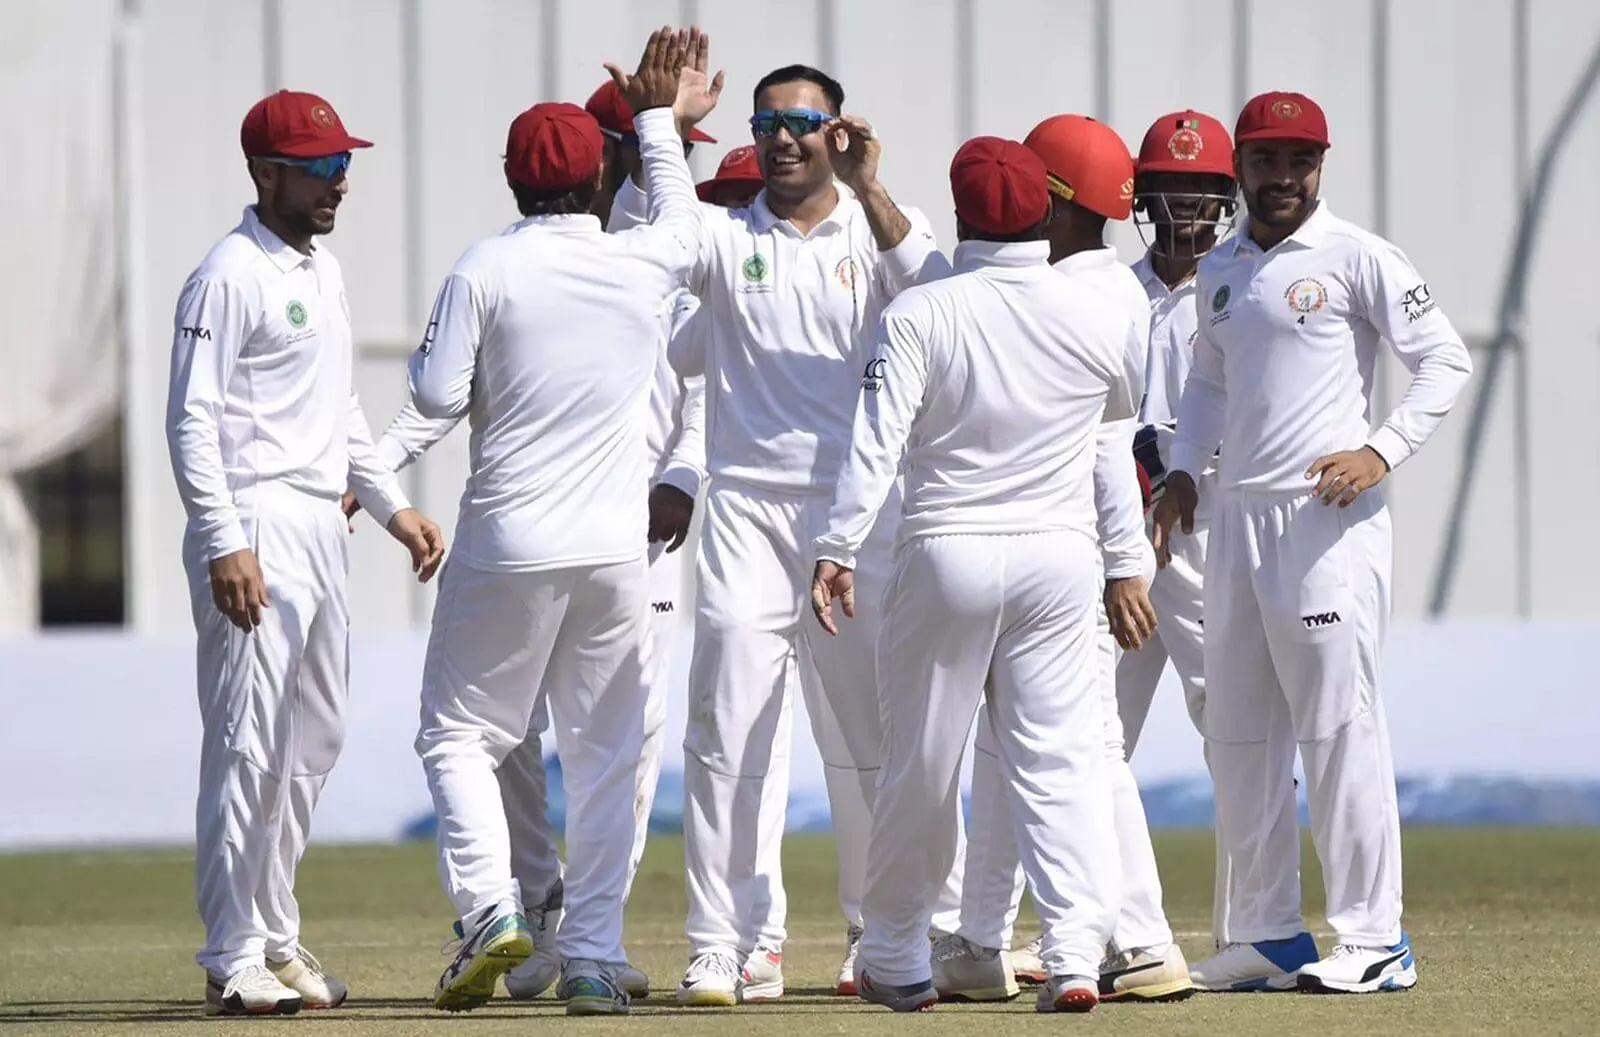 Australia-Afghanistan historic Test going ahead: CA